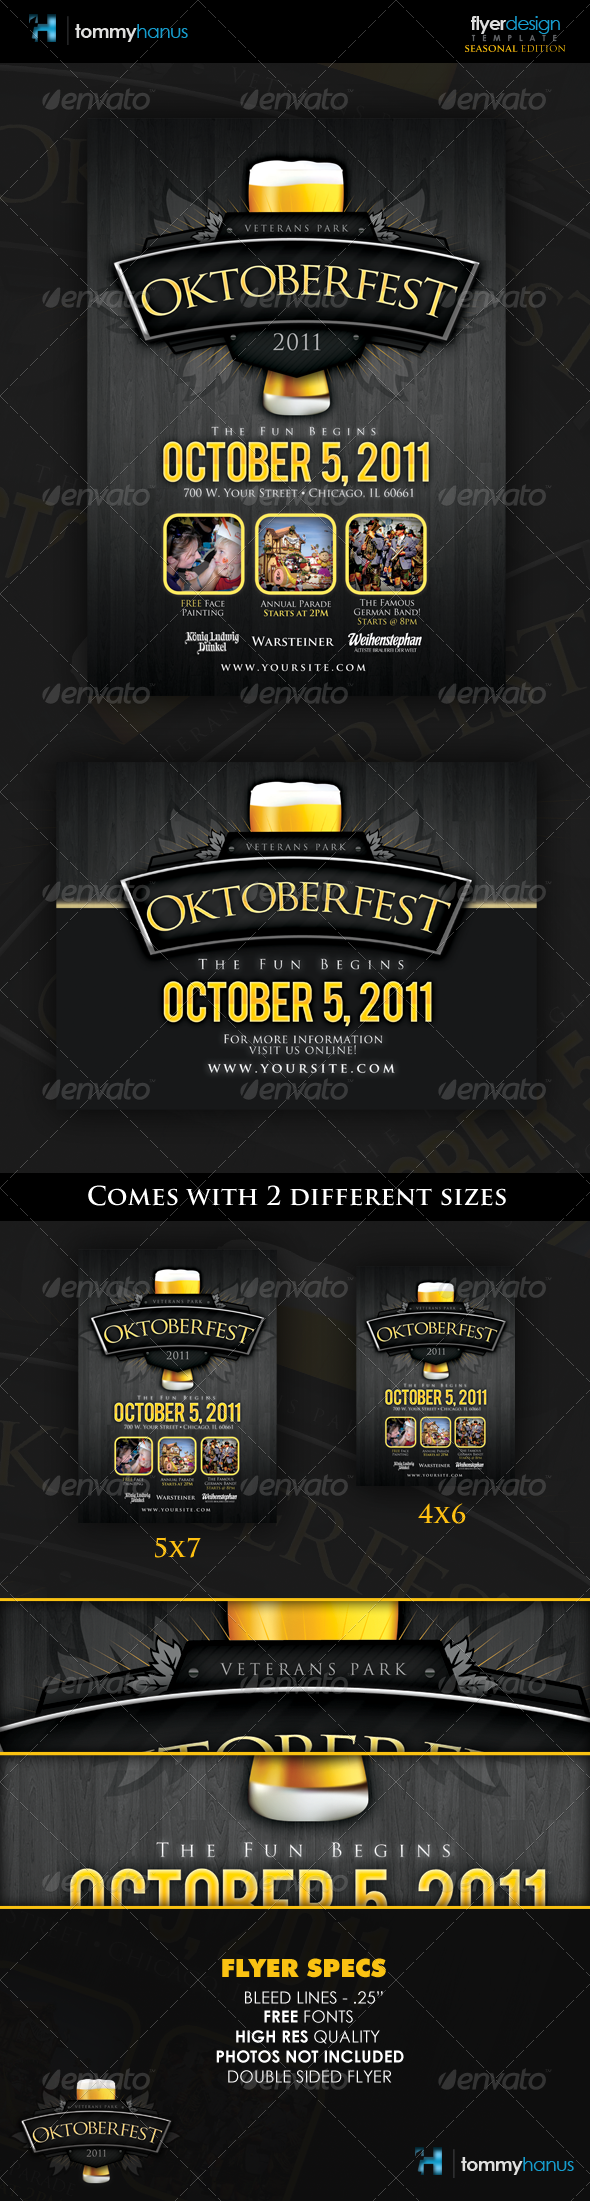 GraphicRiver Oktoberfest Event Flyer Template 460892